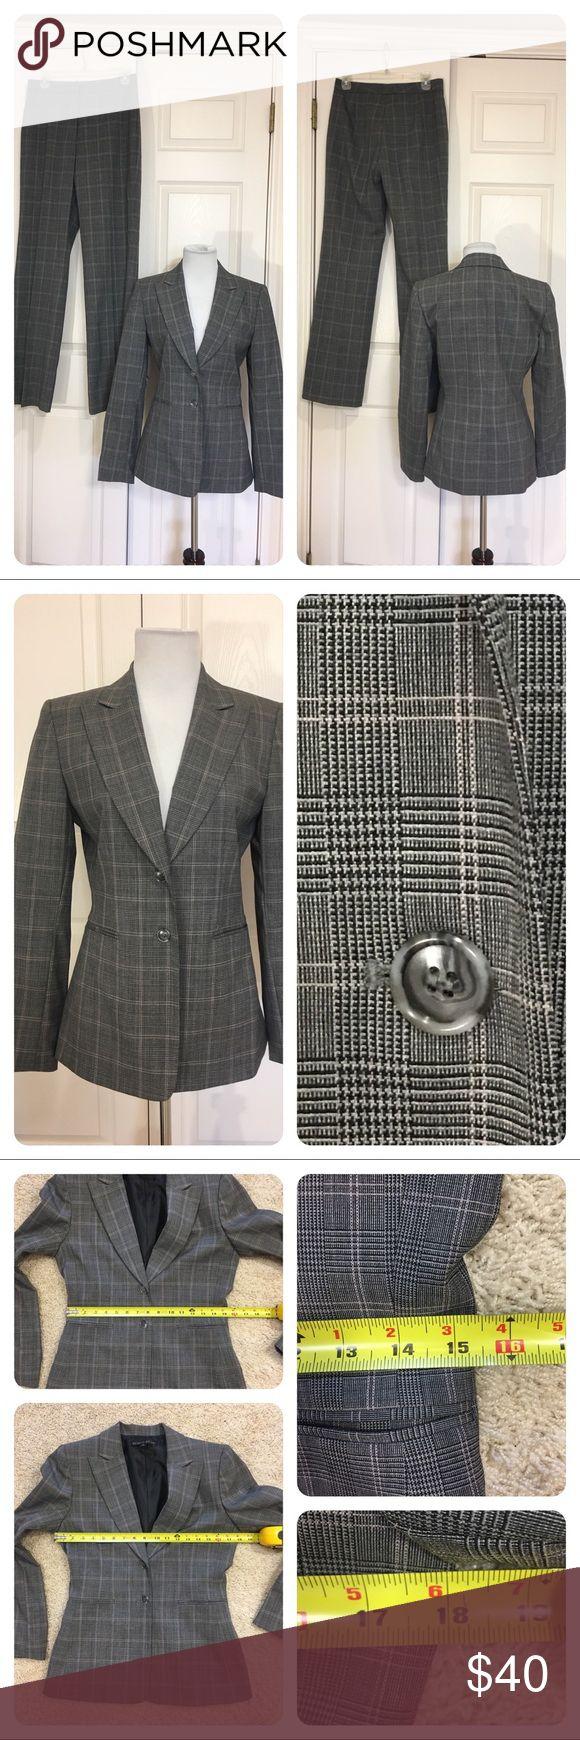 Antonio Melani pant suit Classic plaid pantsuit by Antonio Melani. Great together or as separates. Jacket is a 4. Pants are a 6. ANTONIO MELANI Jackets & Coats Blazers